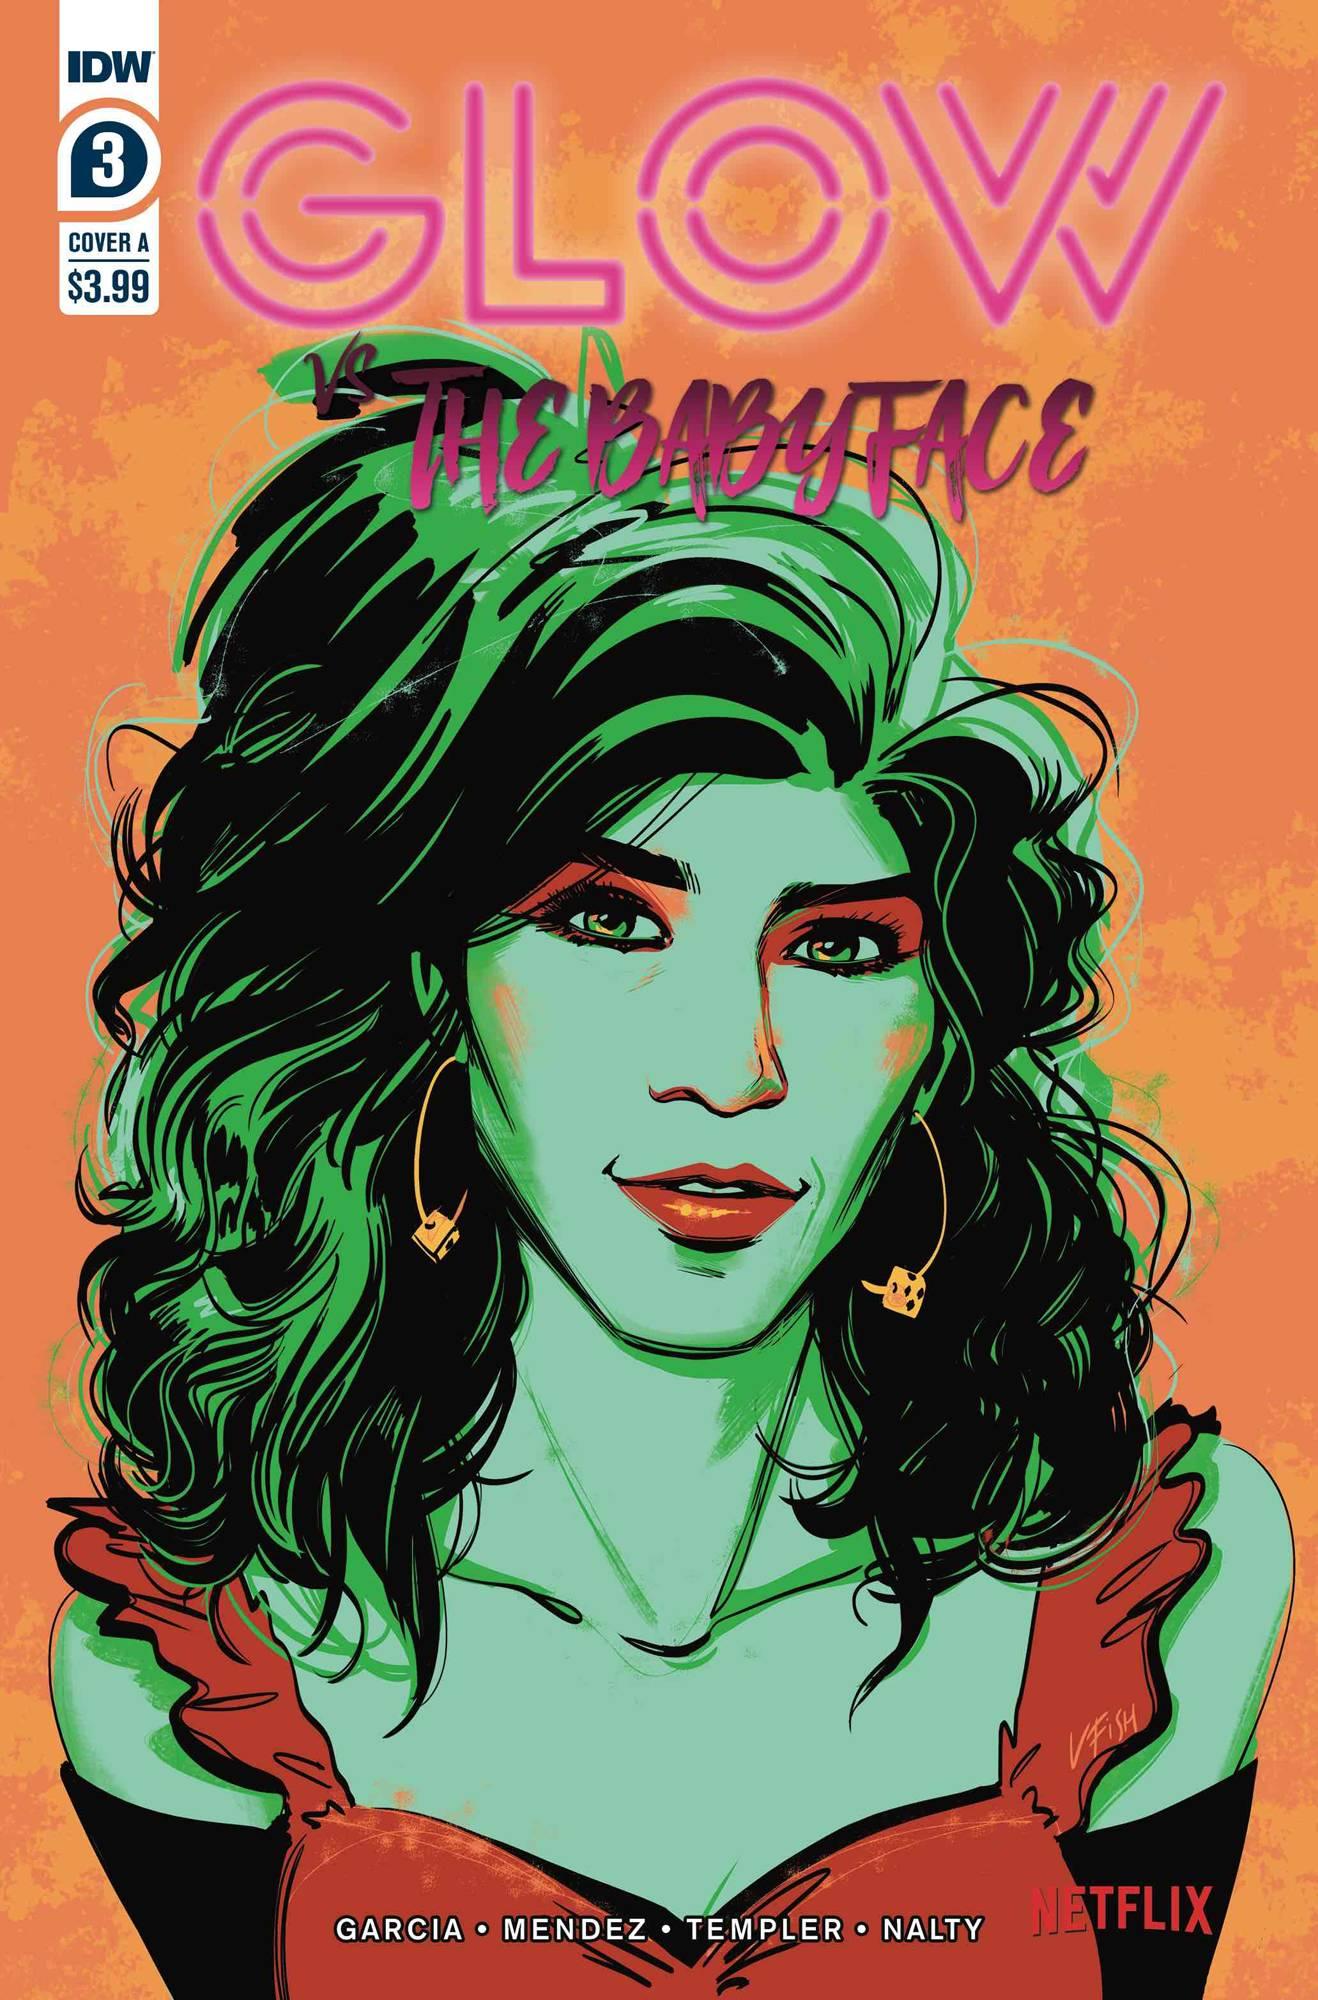 Glow Vs The Babyface #3 (2020)